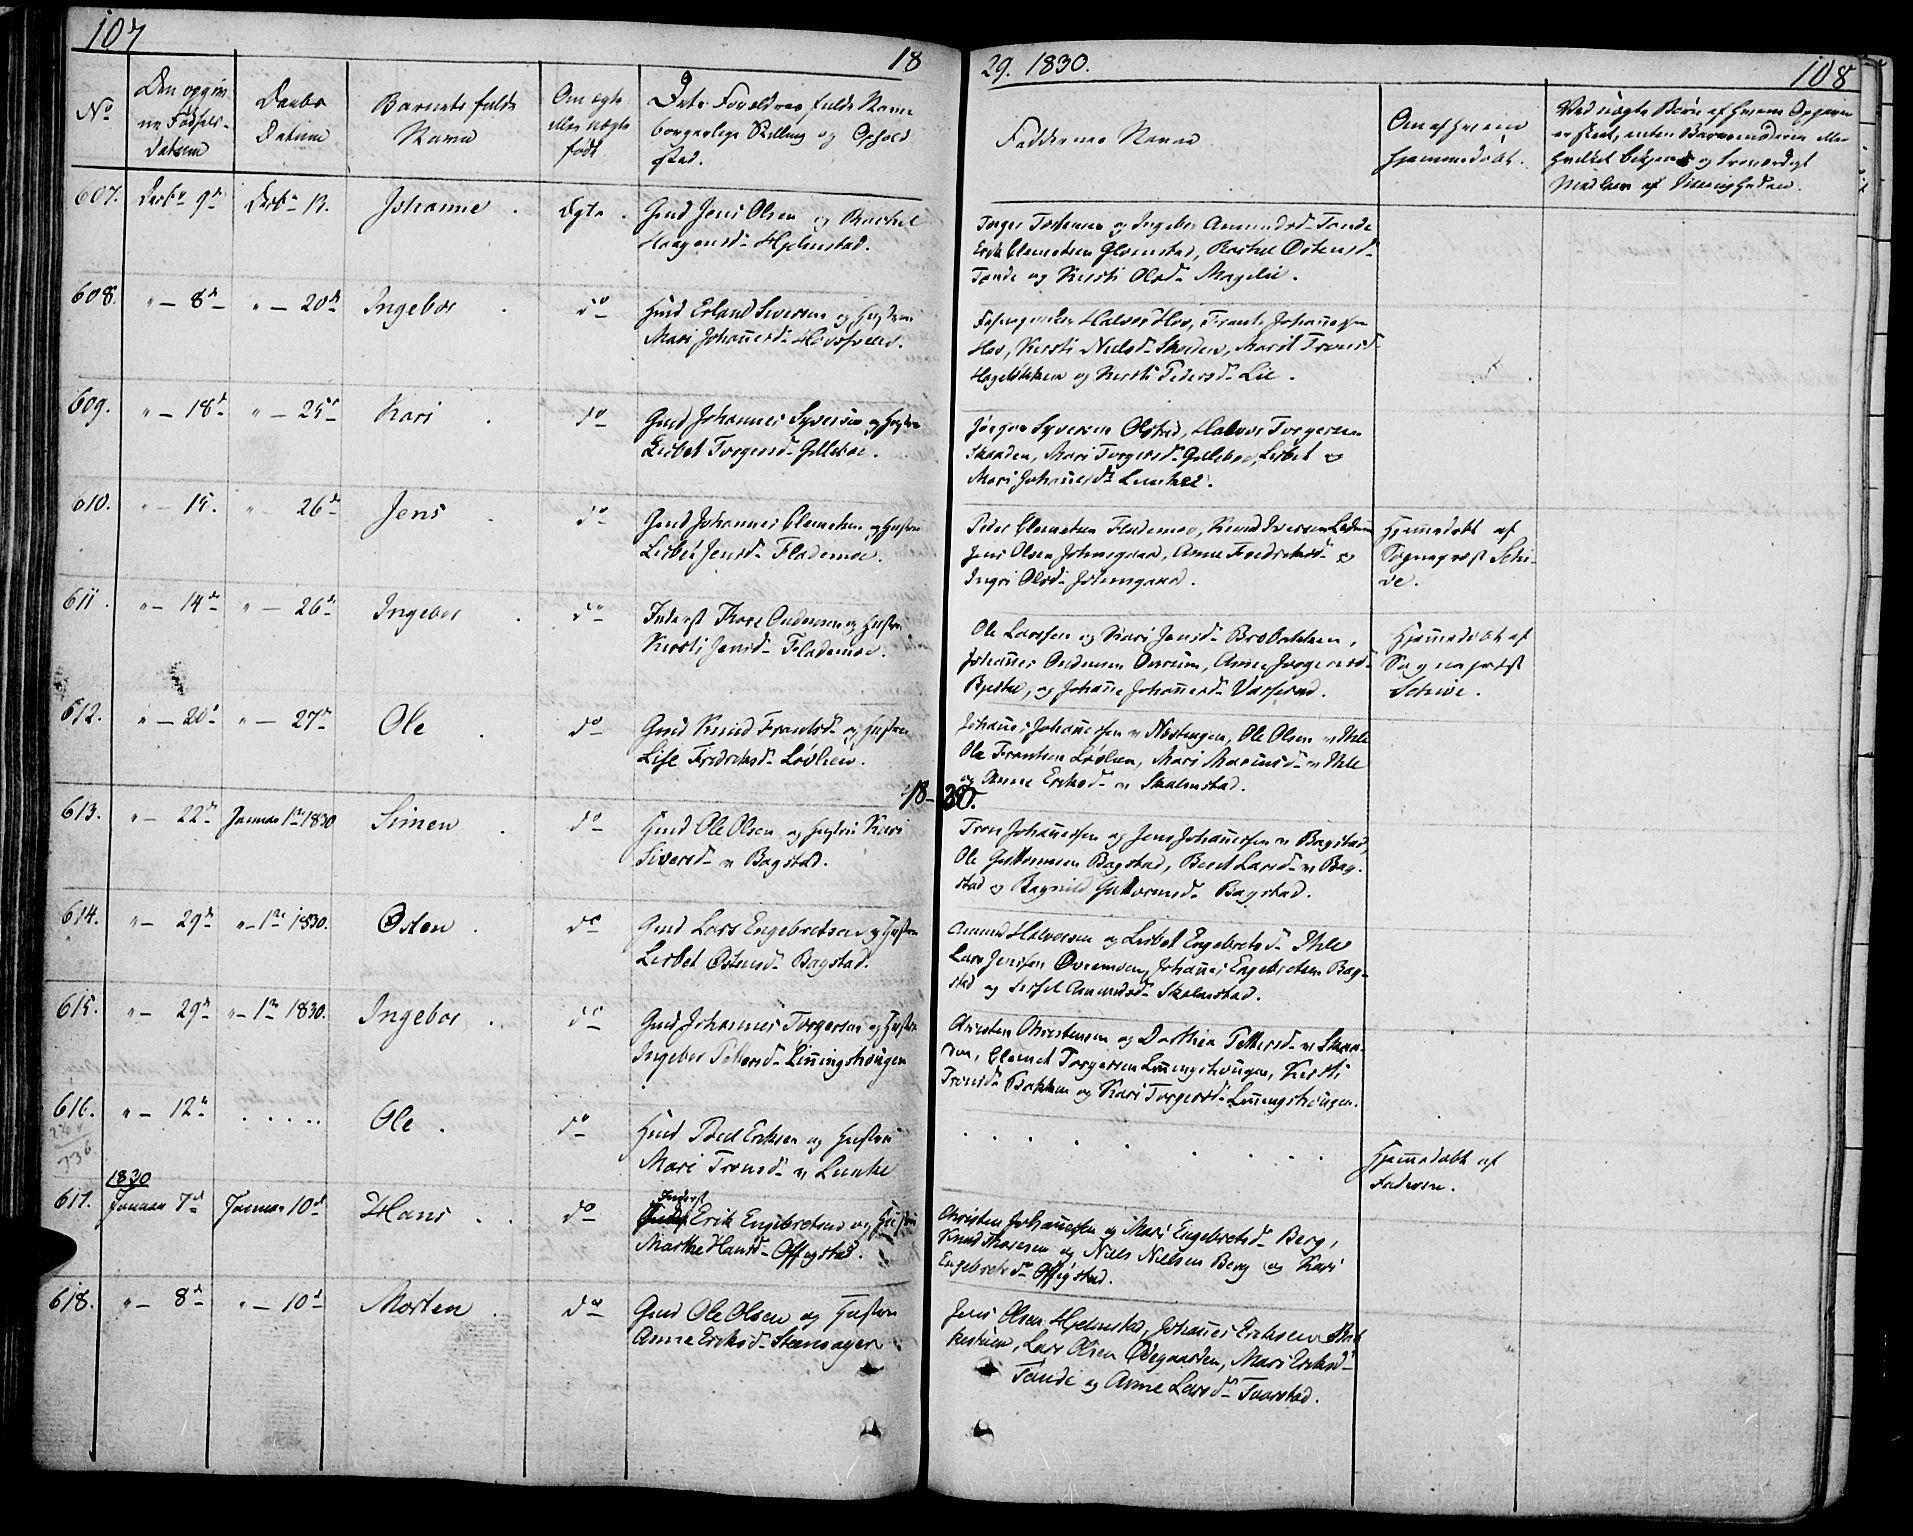 SAH, Øyer prestekontor, Ministerialbok nr. 4, 1824-1841, s. 107-108